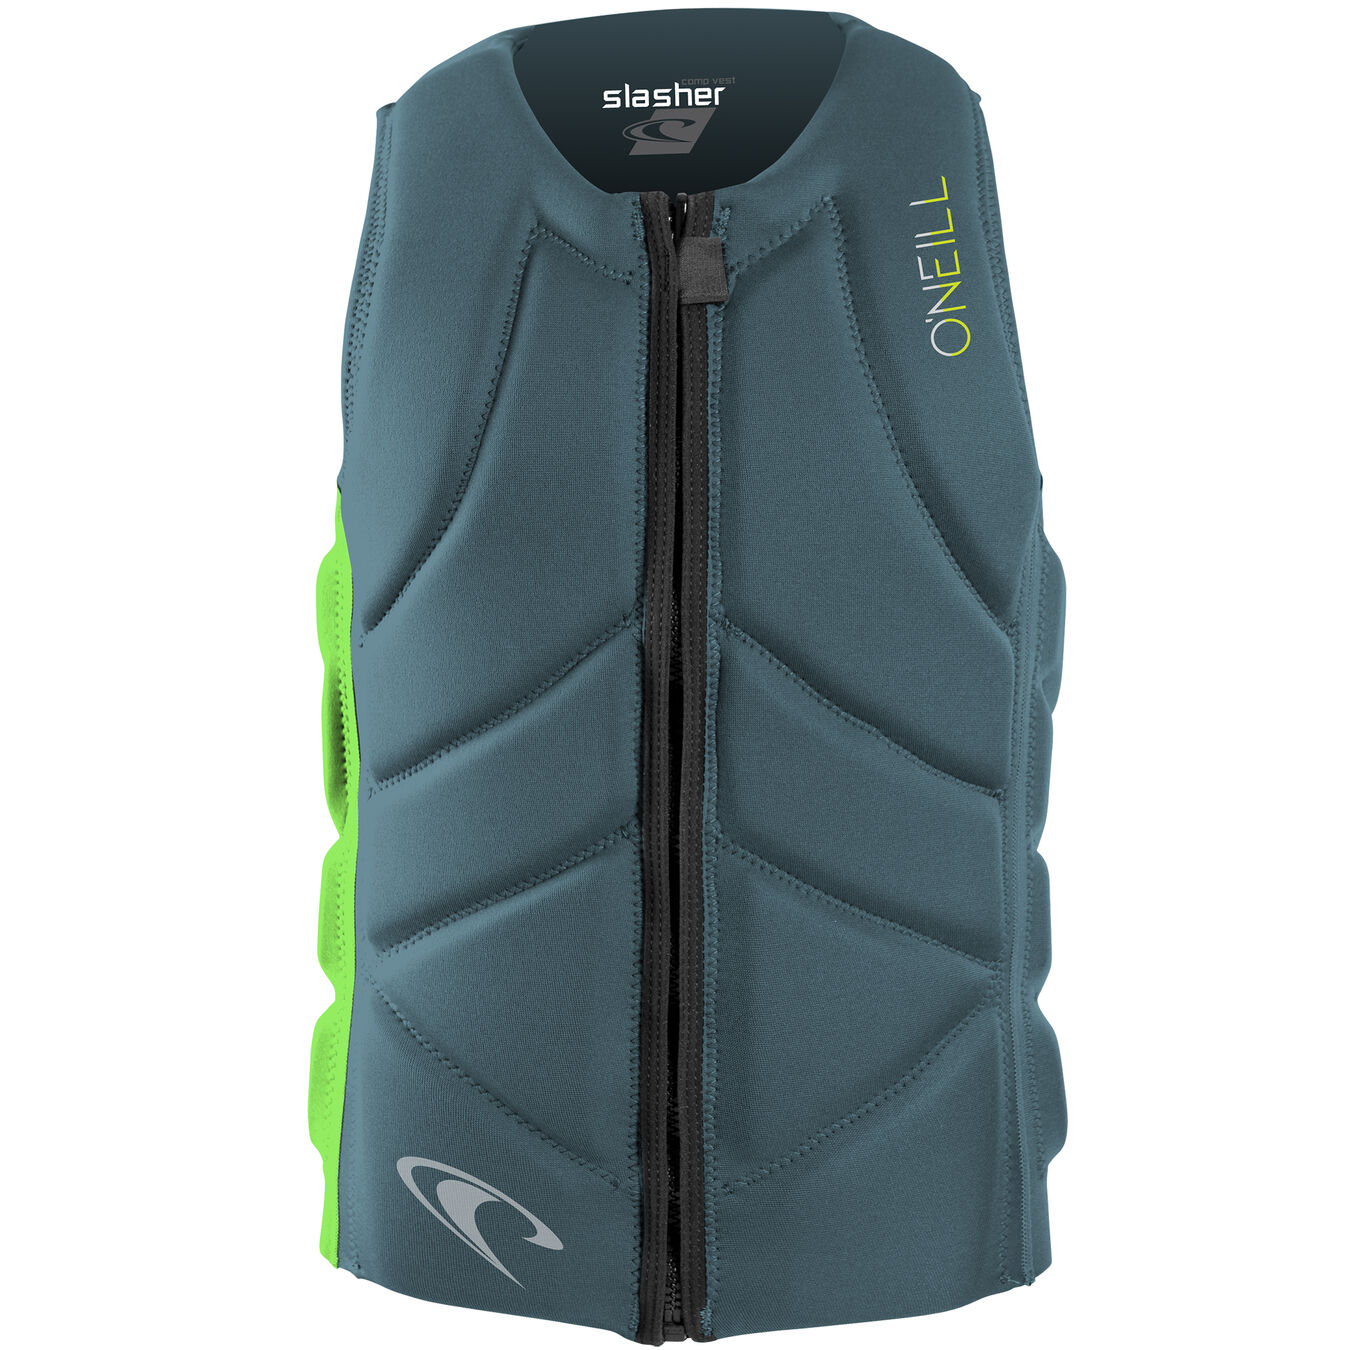 Dark Olive Black F/ácil Top ONeill Mens Slasher Comp Watersports Waterski Jetski Wakeboarding Safety Impact Vest